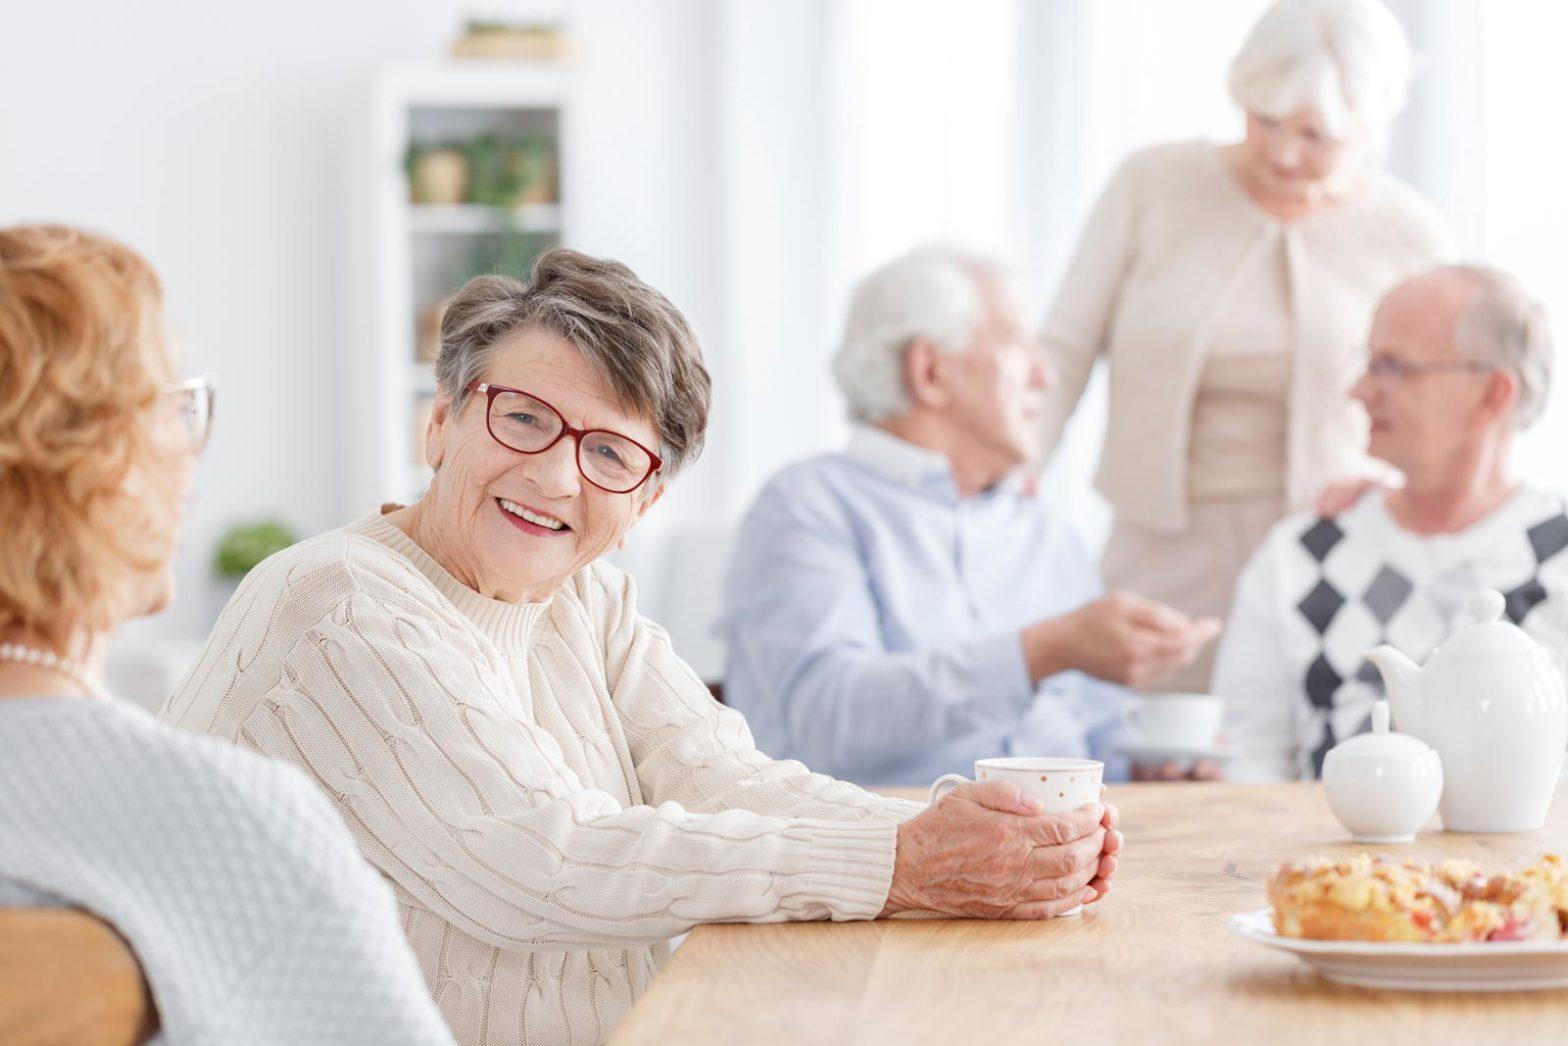 group-medical-insurance